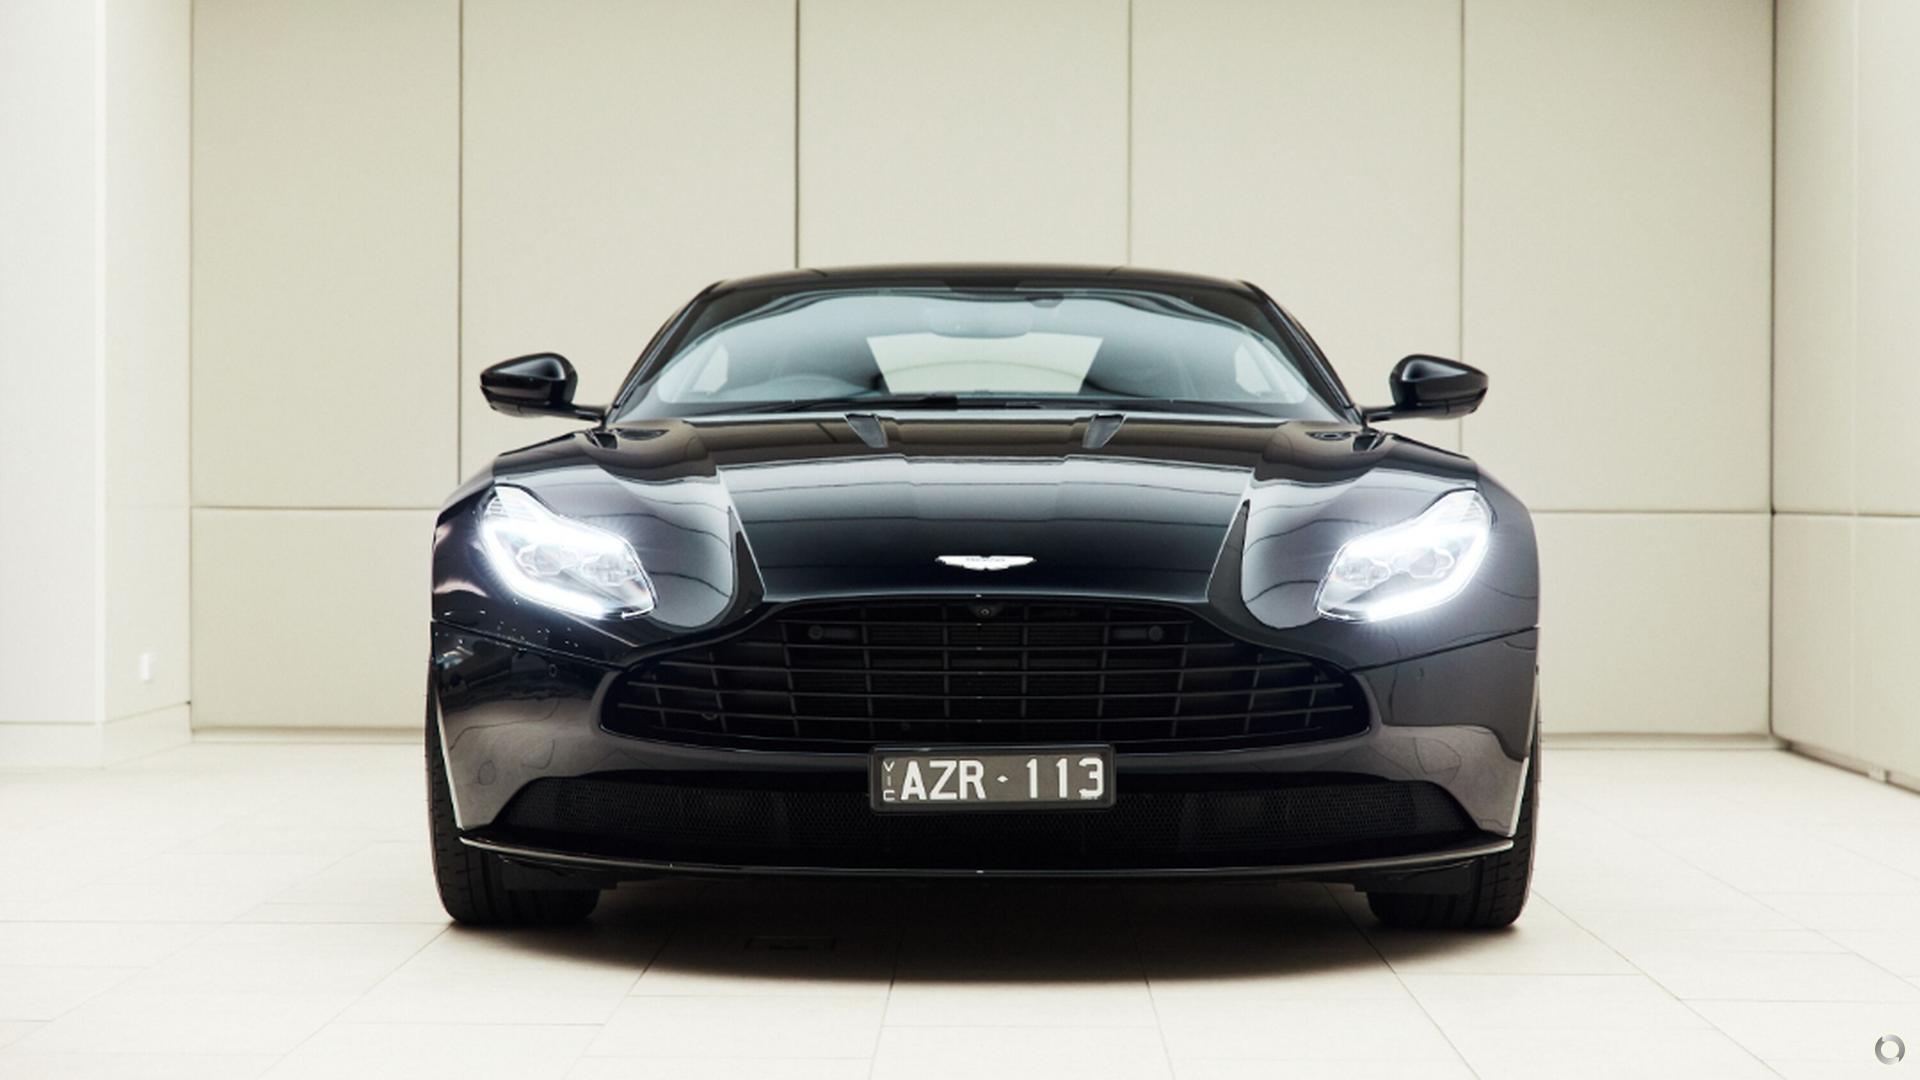 2017 Aston Martin DB11 Launch Edition (No Series)